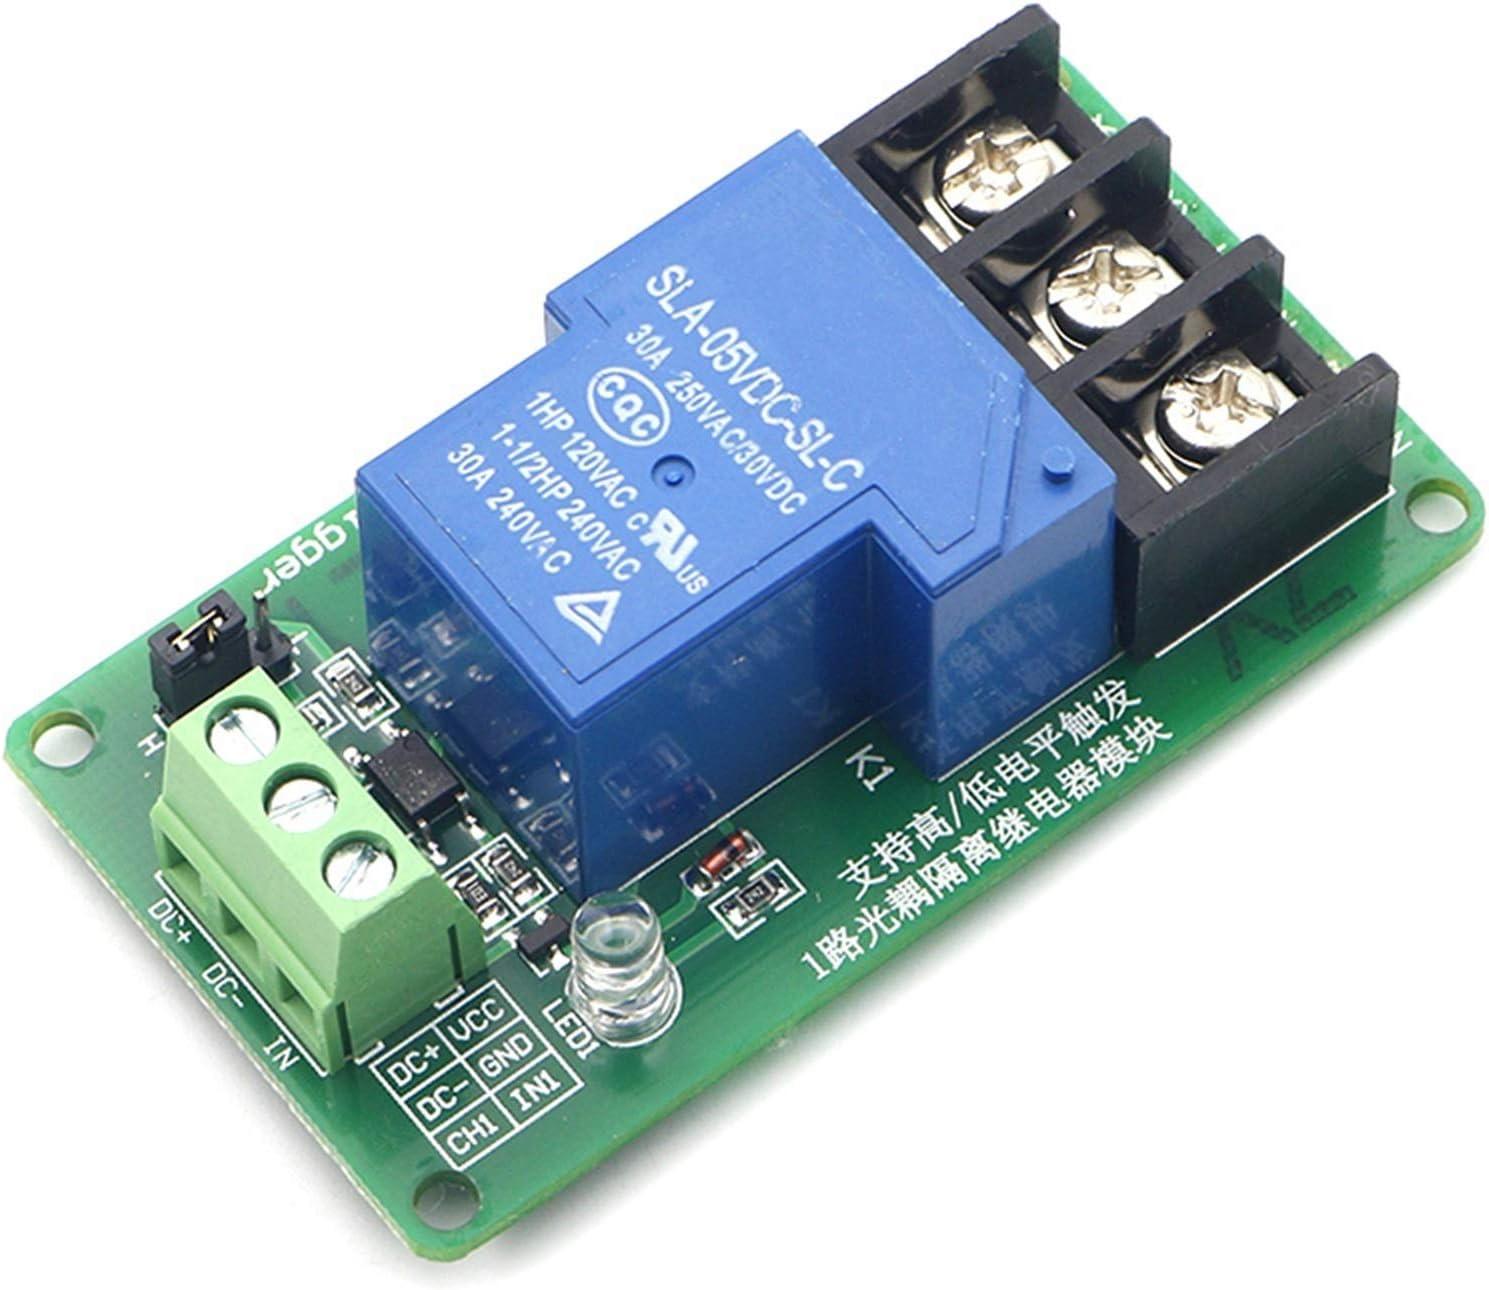 JSJJAES Un módulo de relé de 1 Canal 30A con el Aislamiento de optoacoplador 5V 12V 24V admite un gatillo de triger de Alto y bajo (Size : 24V)